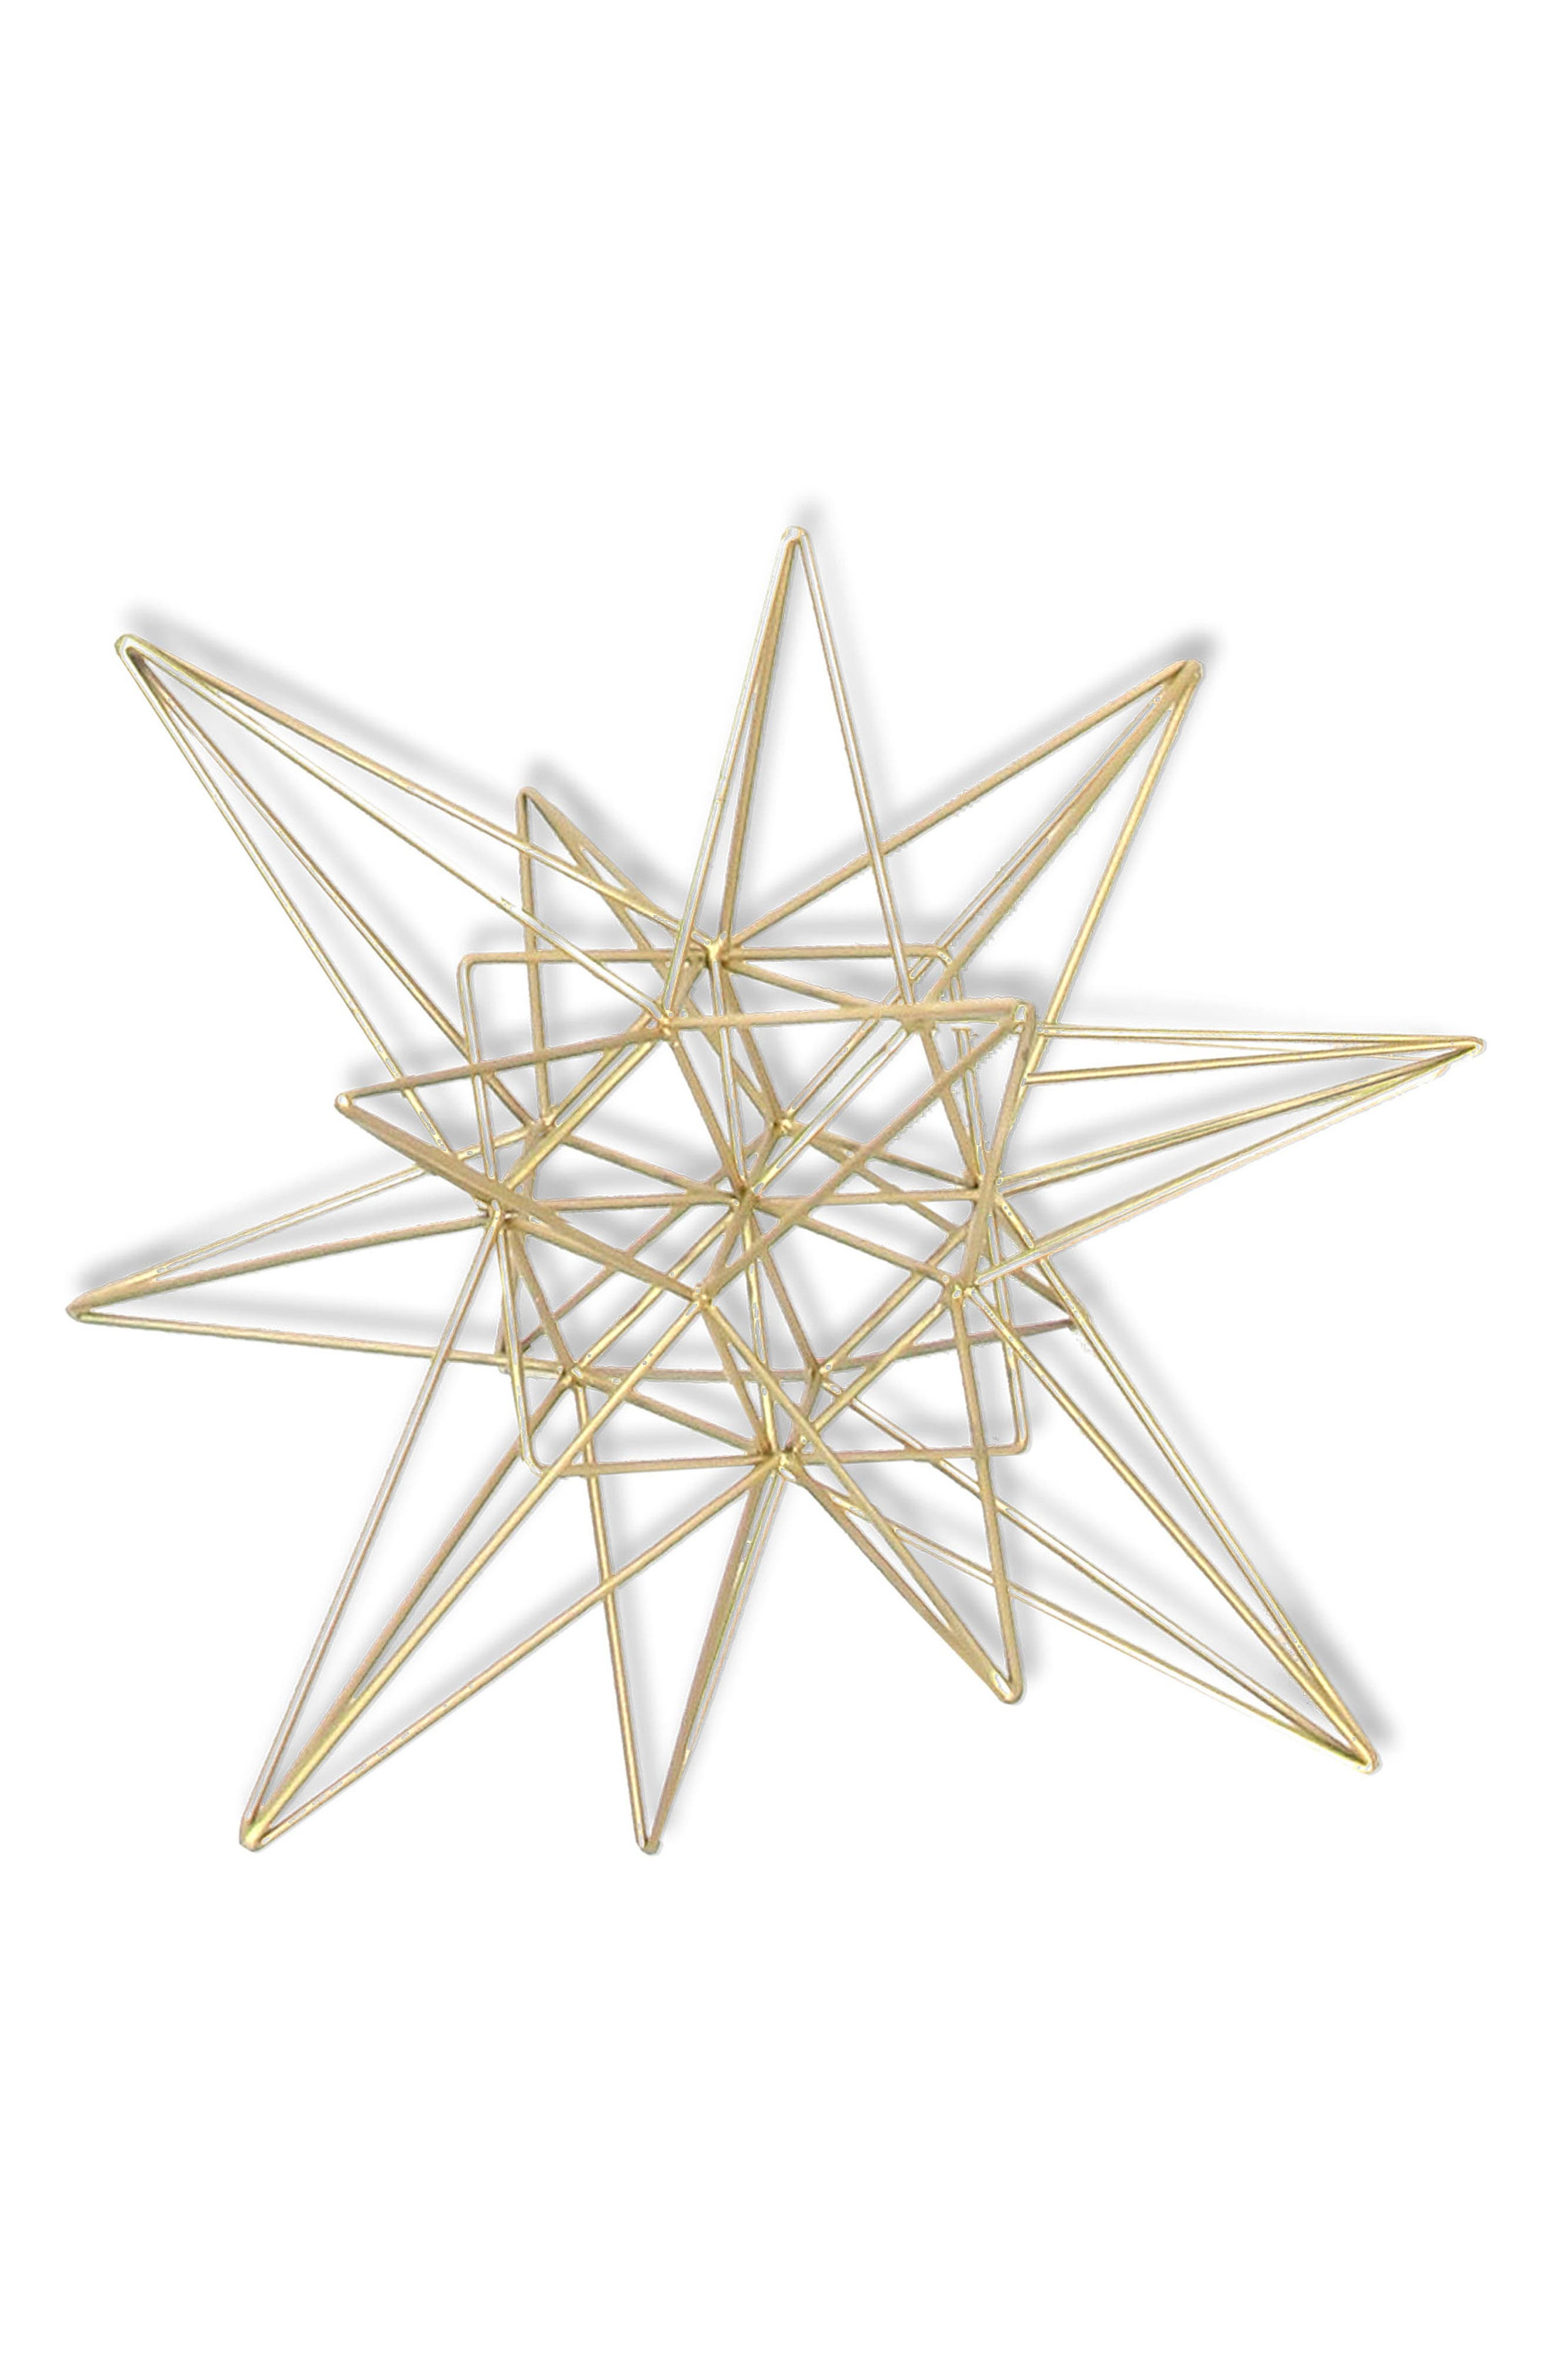 3D Star Goldtone Tabletop Decoration,                             Main thumbnail 1, color,                             710